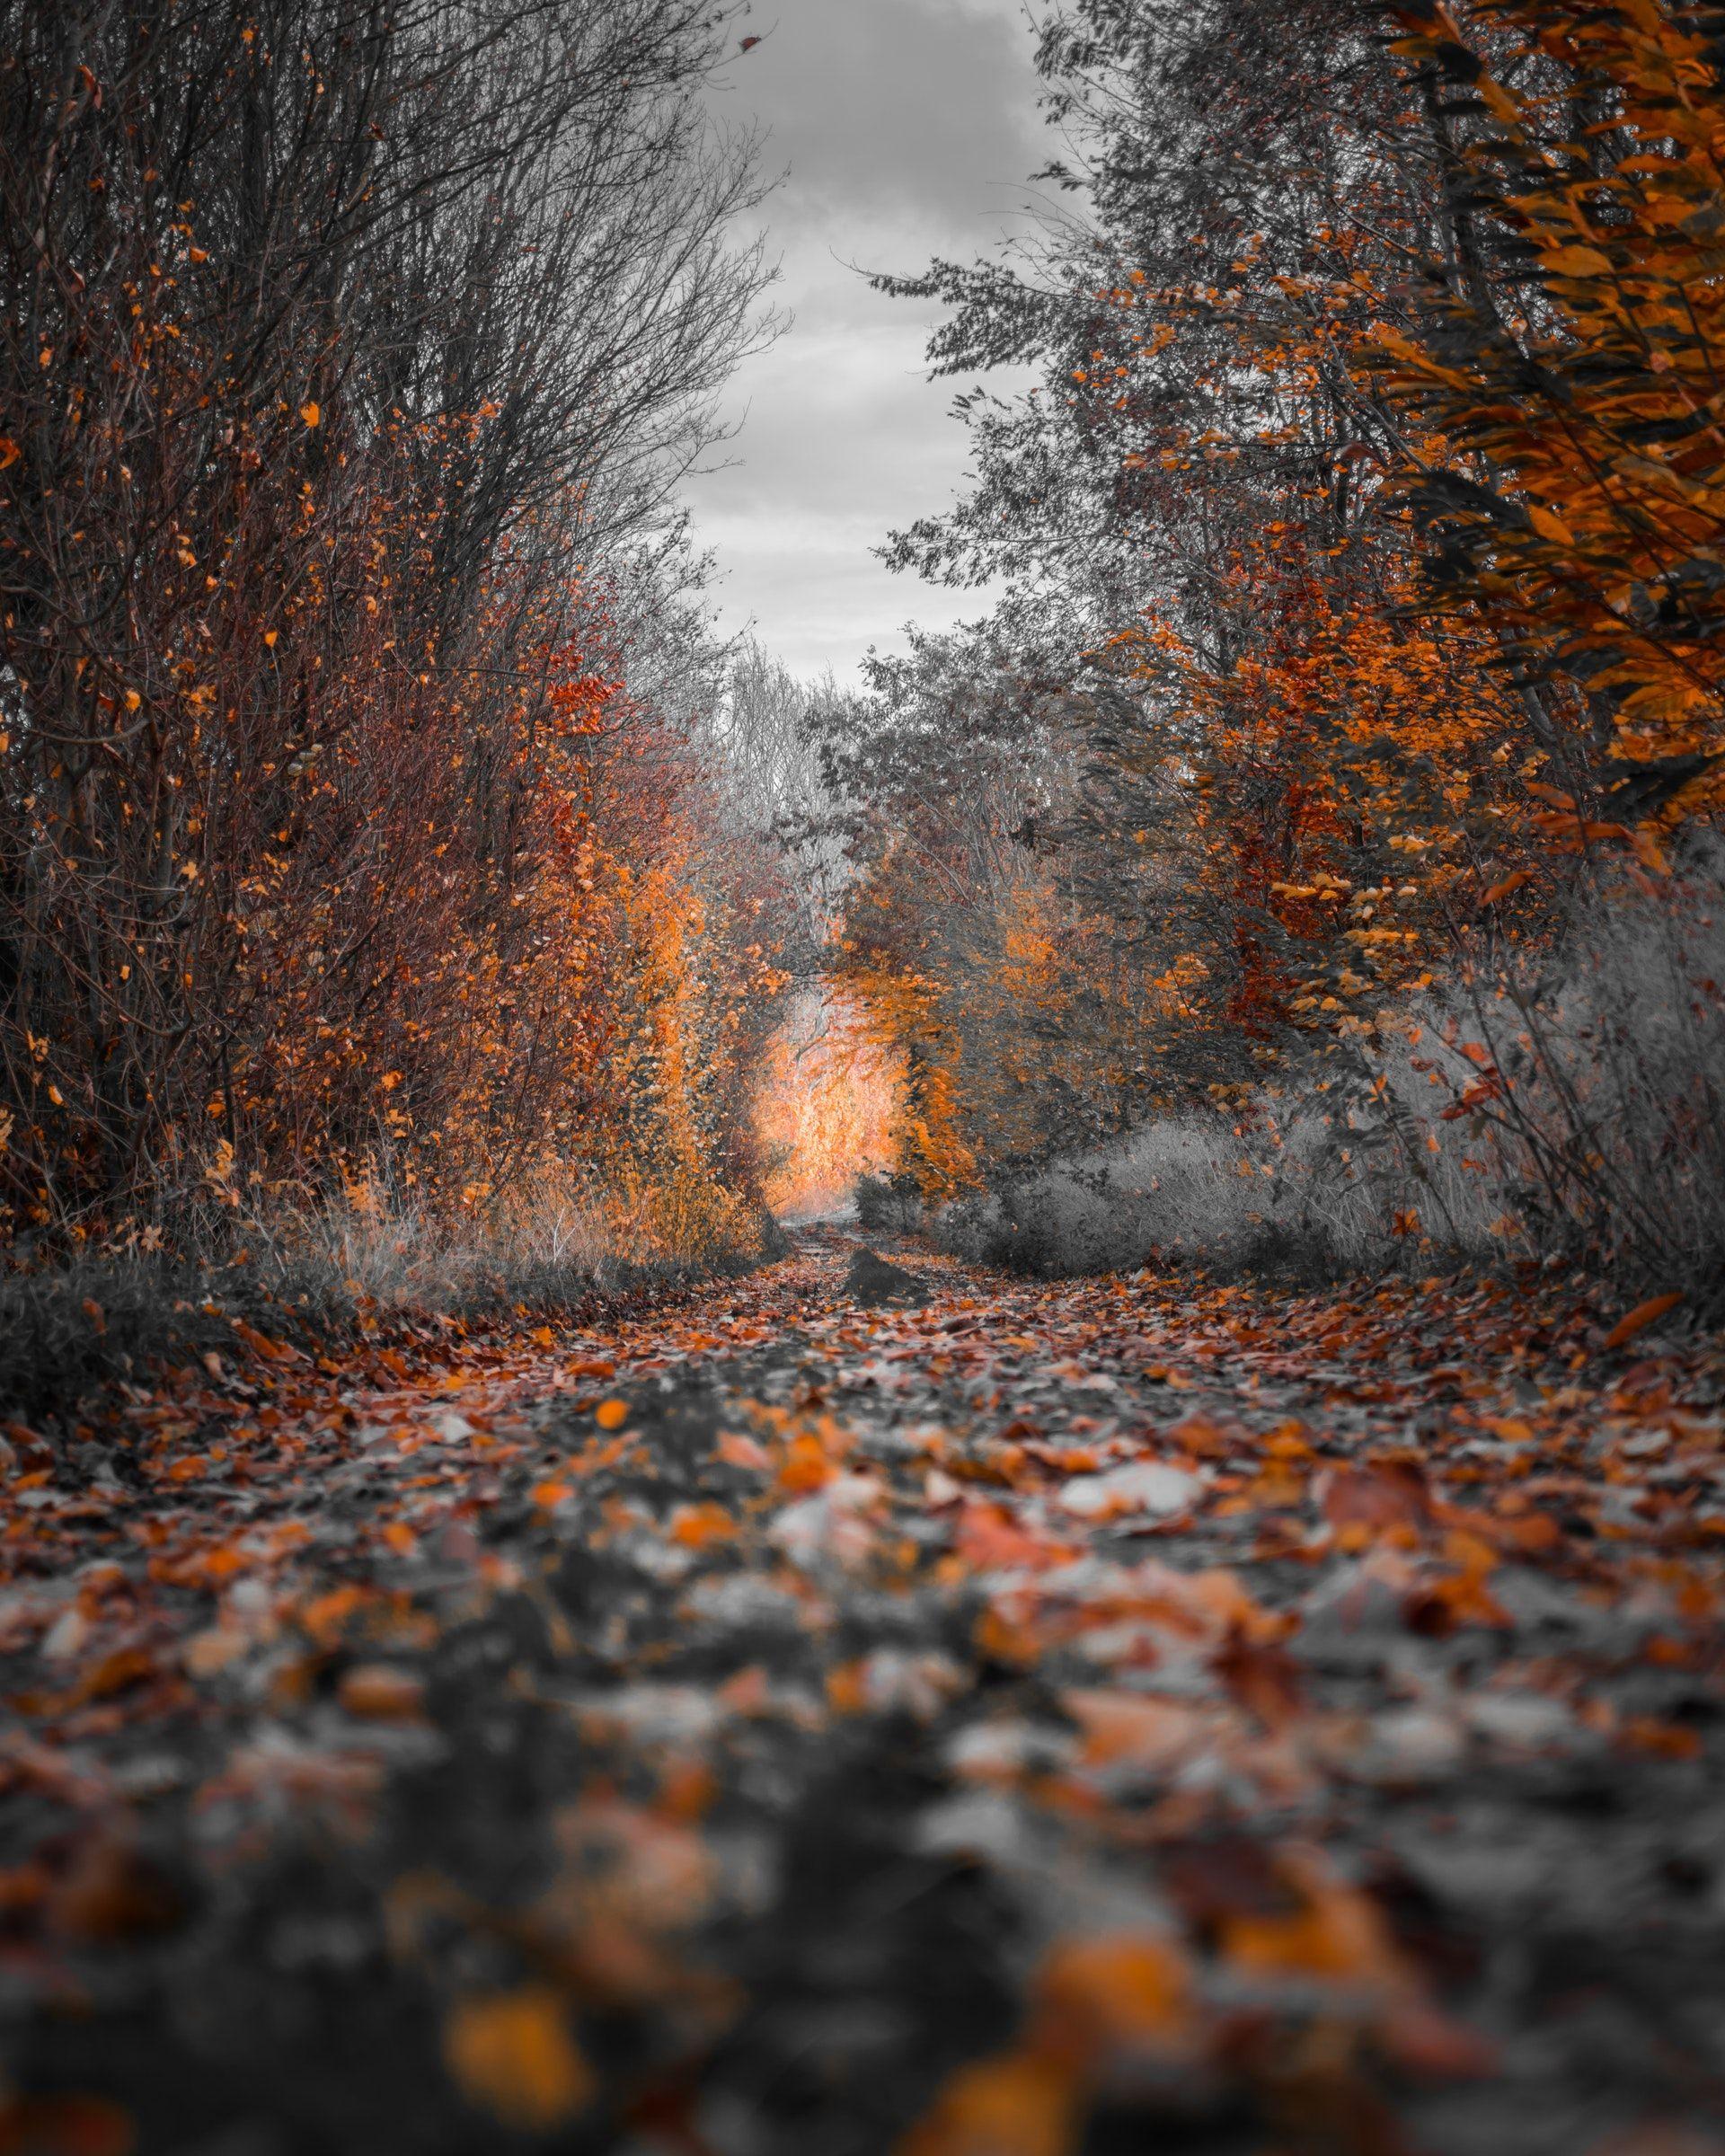 عکس زمینه درختان پاییز پس زمینه